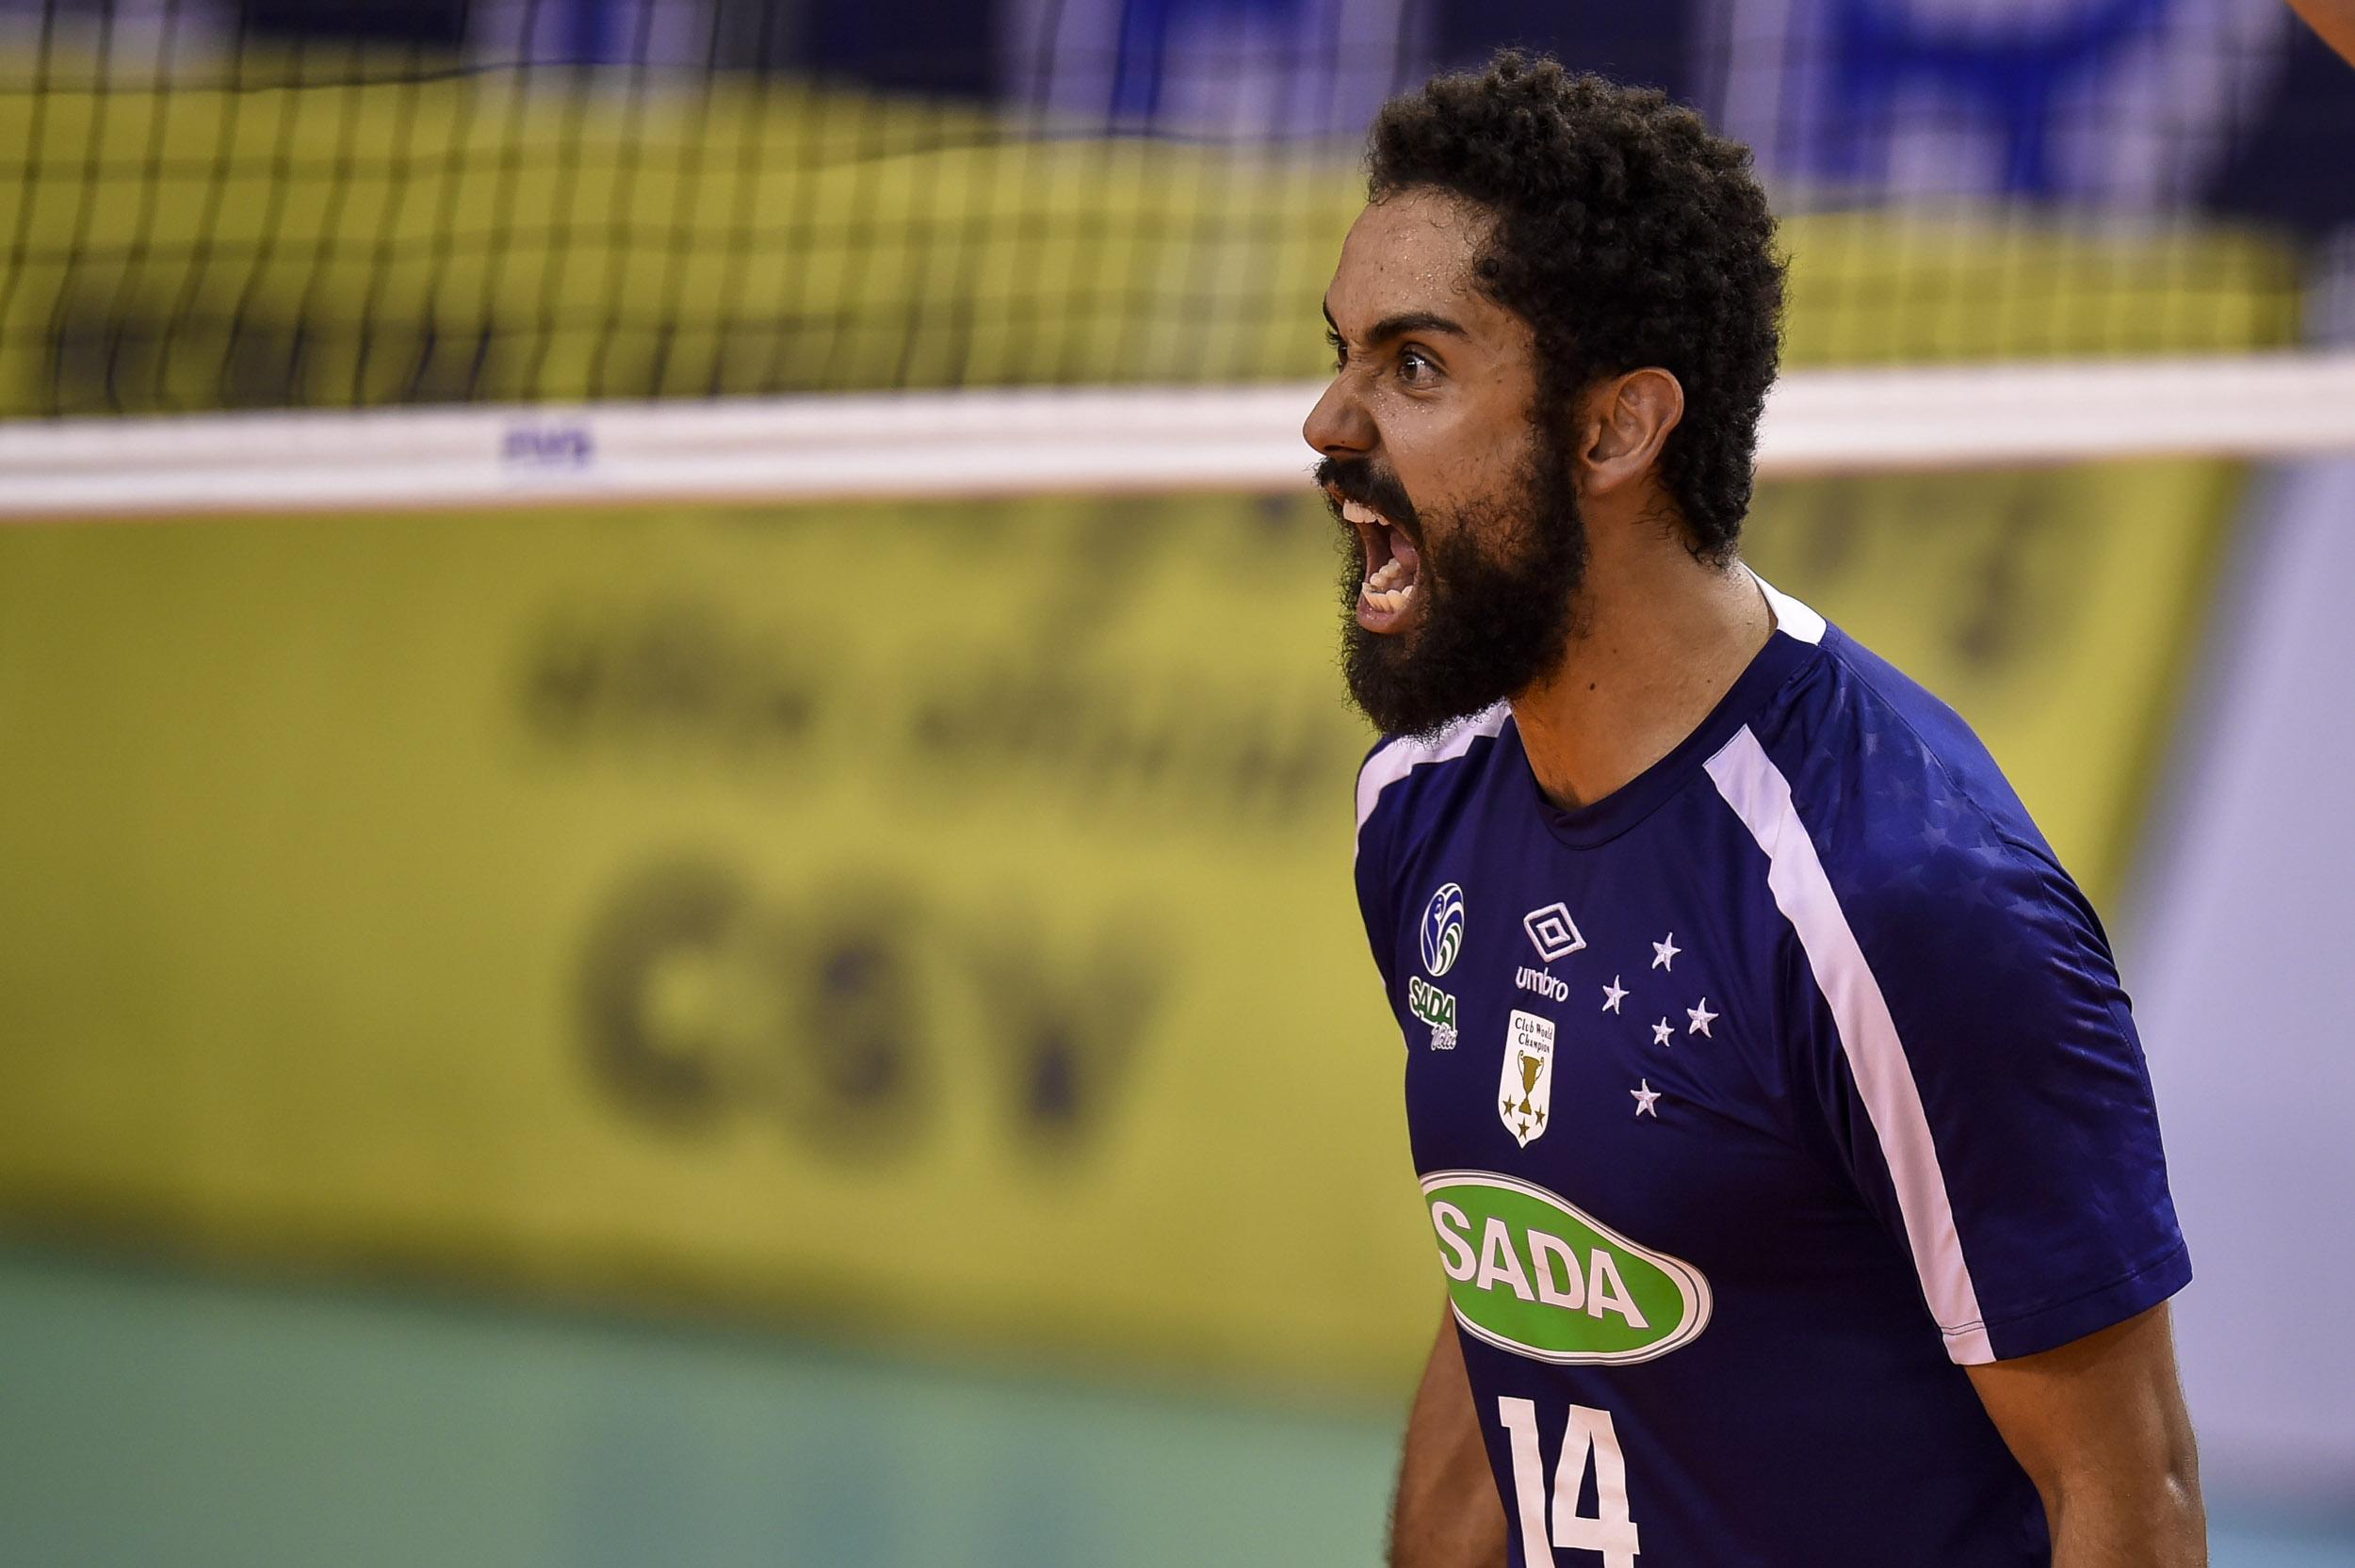 Fernando Cachopa comemora fase feliz no Sada Cruzeiro?20200220011023